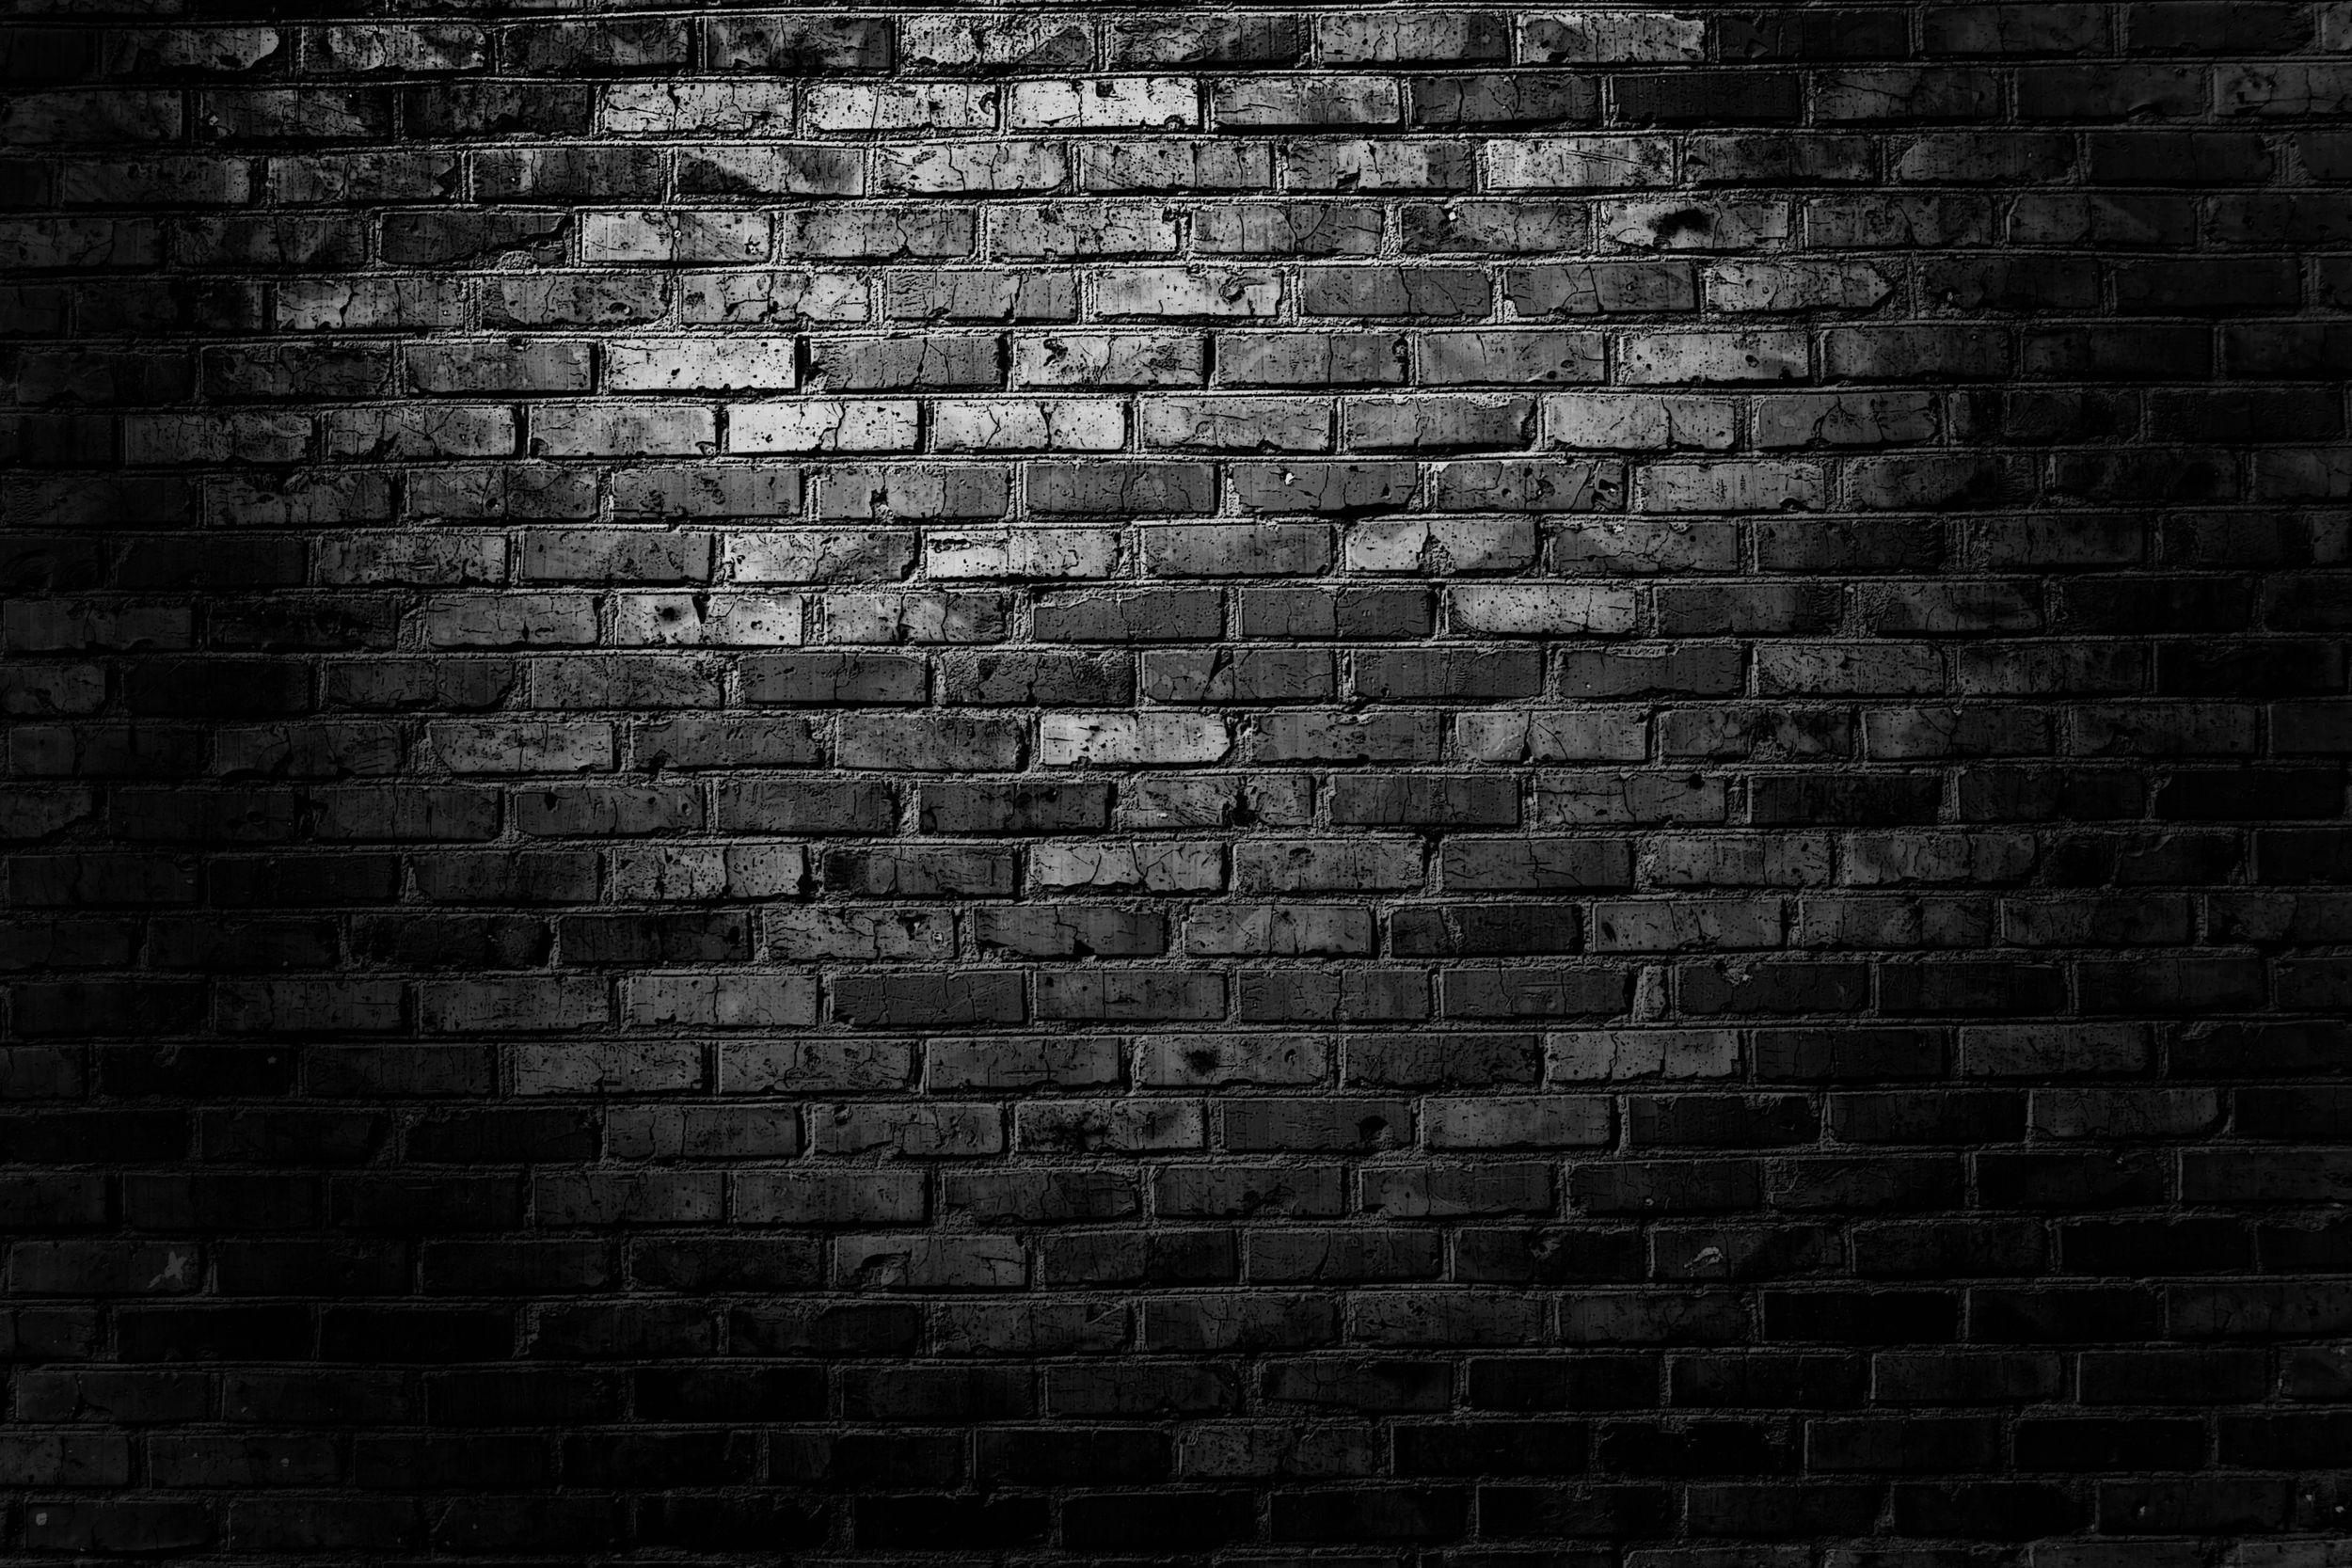 Dark Wall Wallpapers Top Free Dark Wall Backgrounds Wallpaperaccess